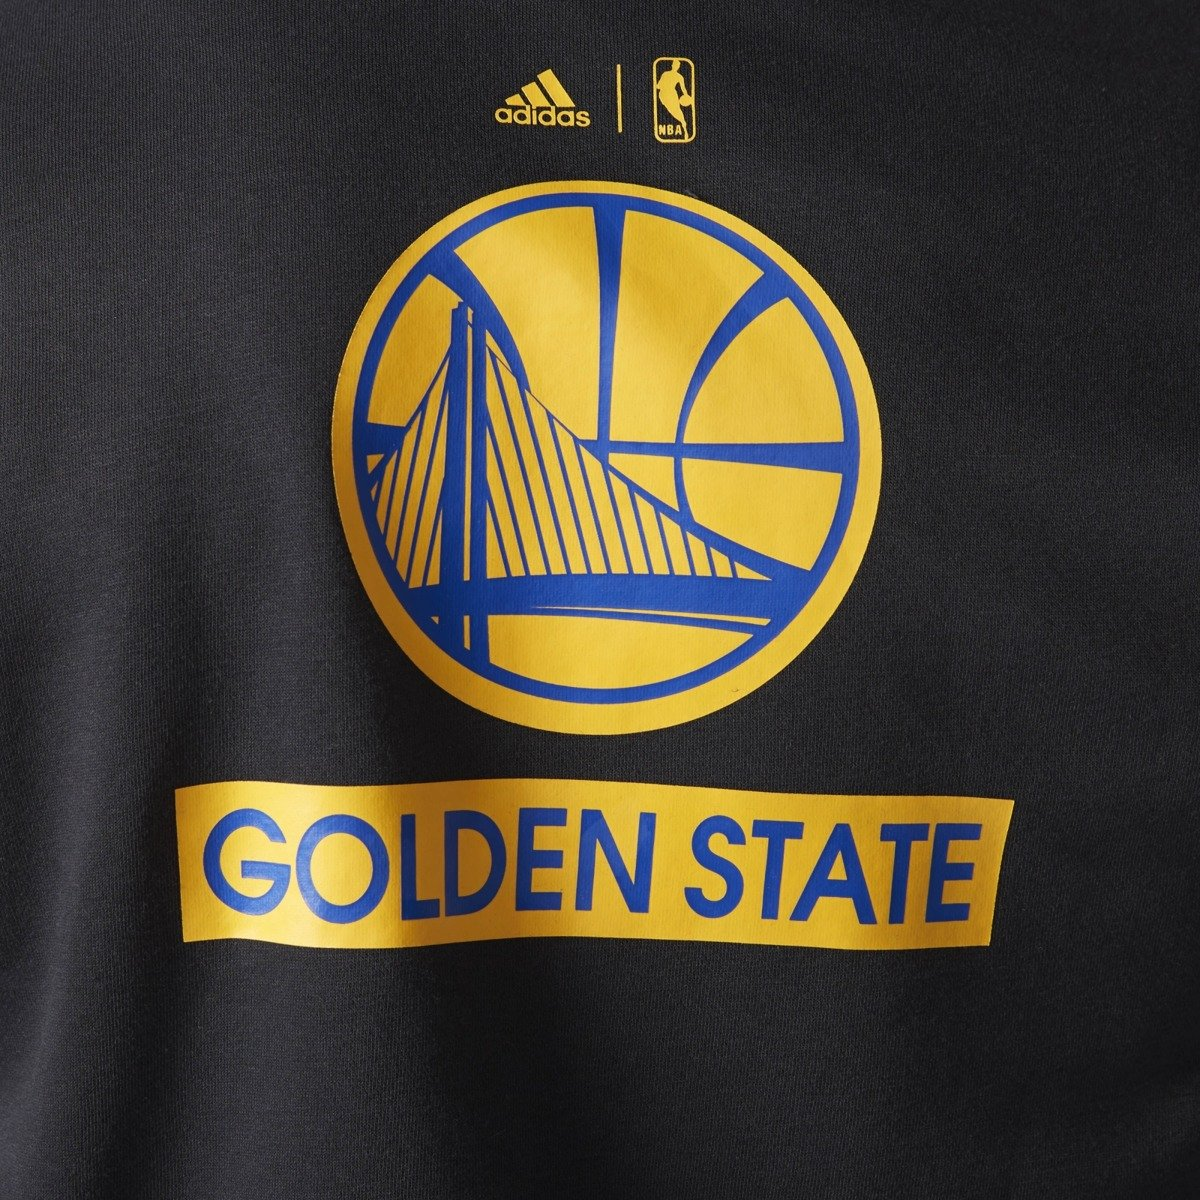 Golden State Warriors: Adidas Golden State Warriors Hoodie - S96822